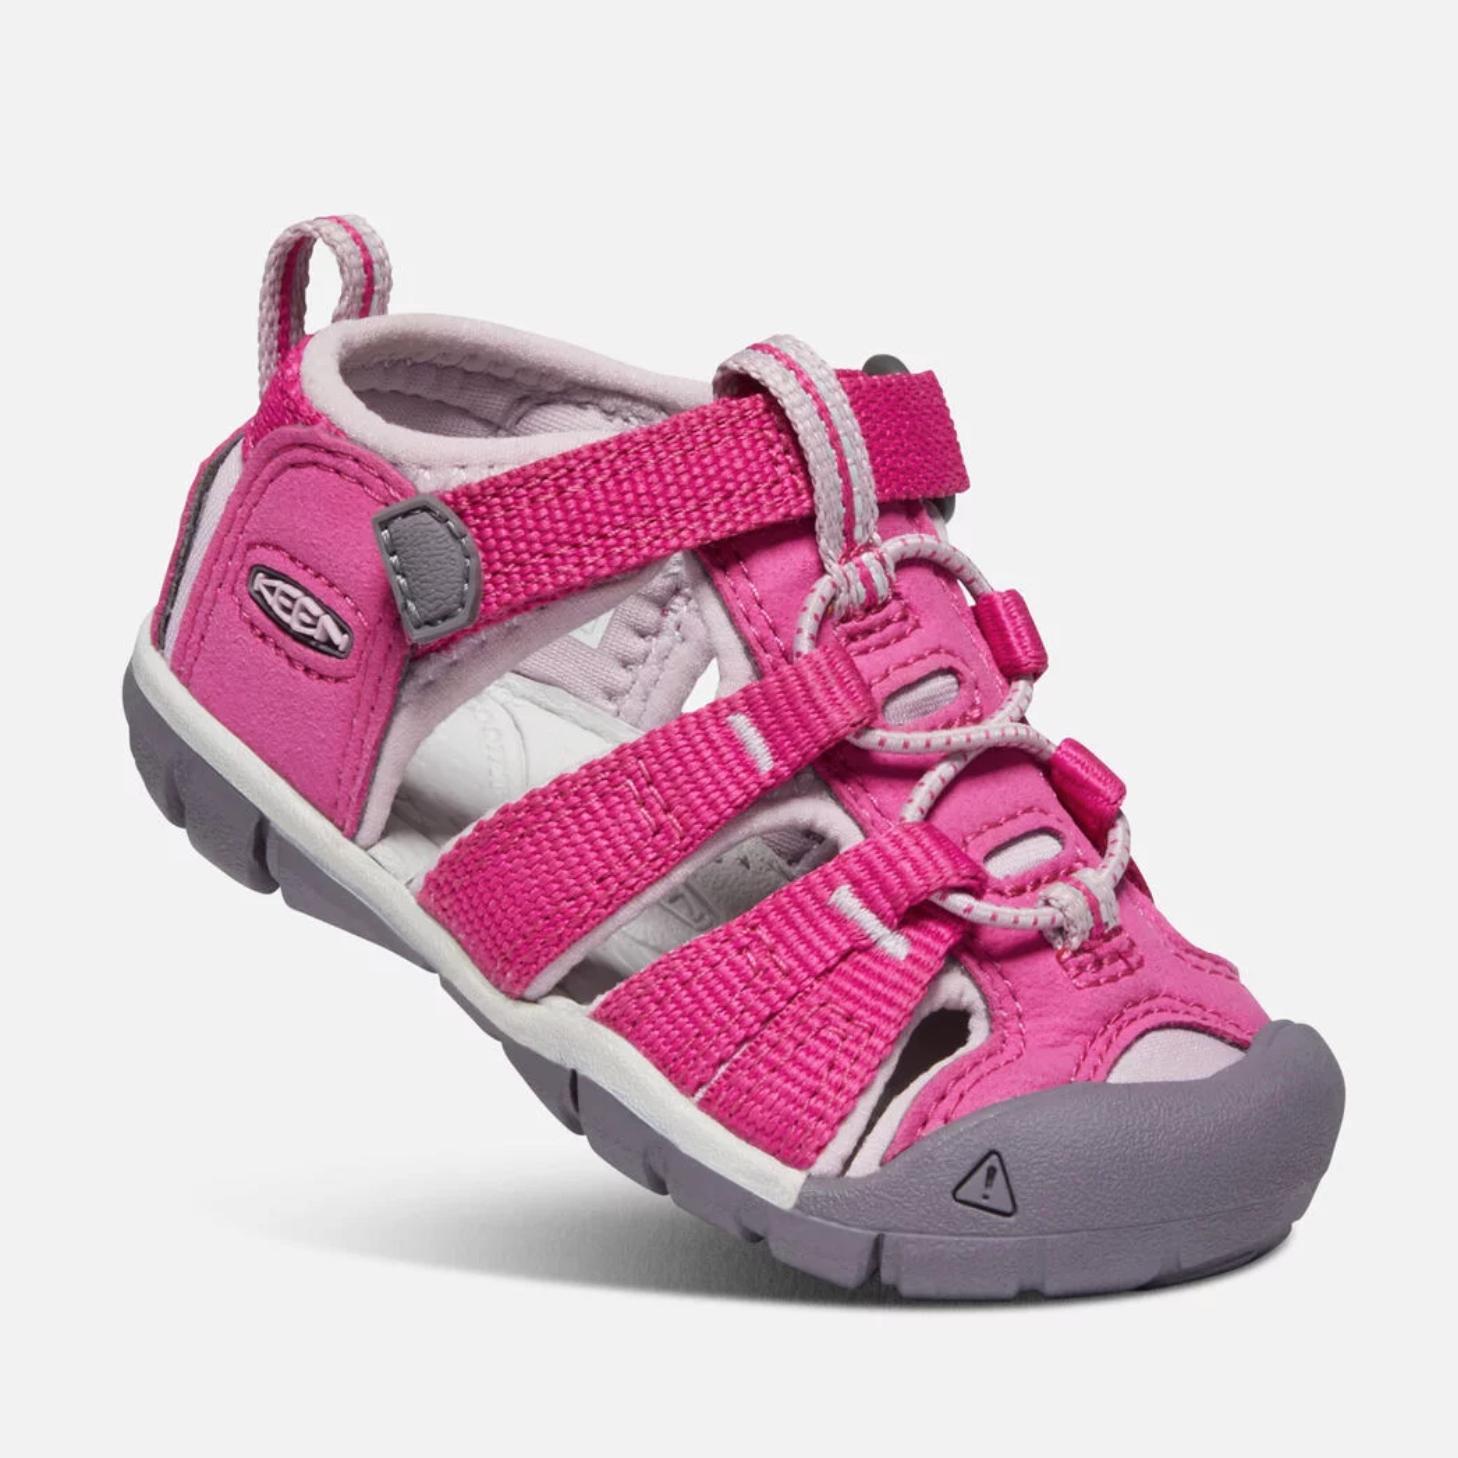 NEW girl KEEN seacamp II CNX Sandals waterproof shoes very berry 6 7 8 9 10 12